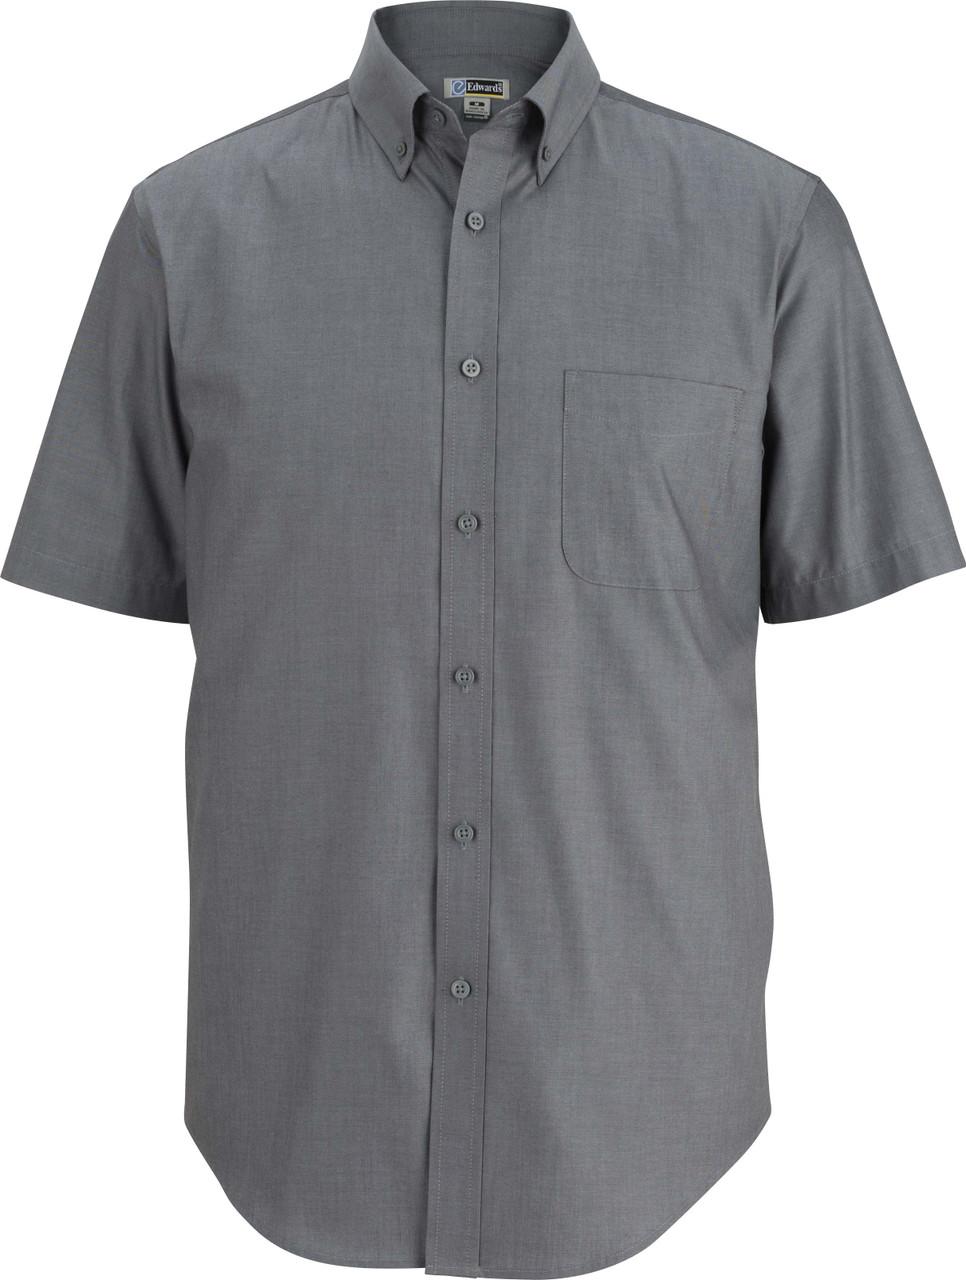 Men's Wrinkle Free Staff Uniform Oxford